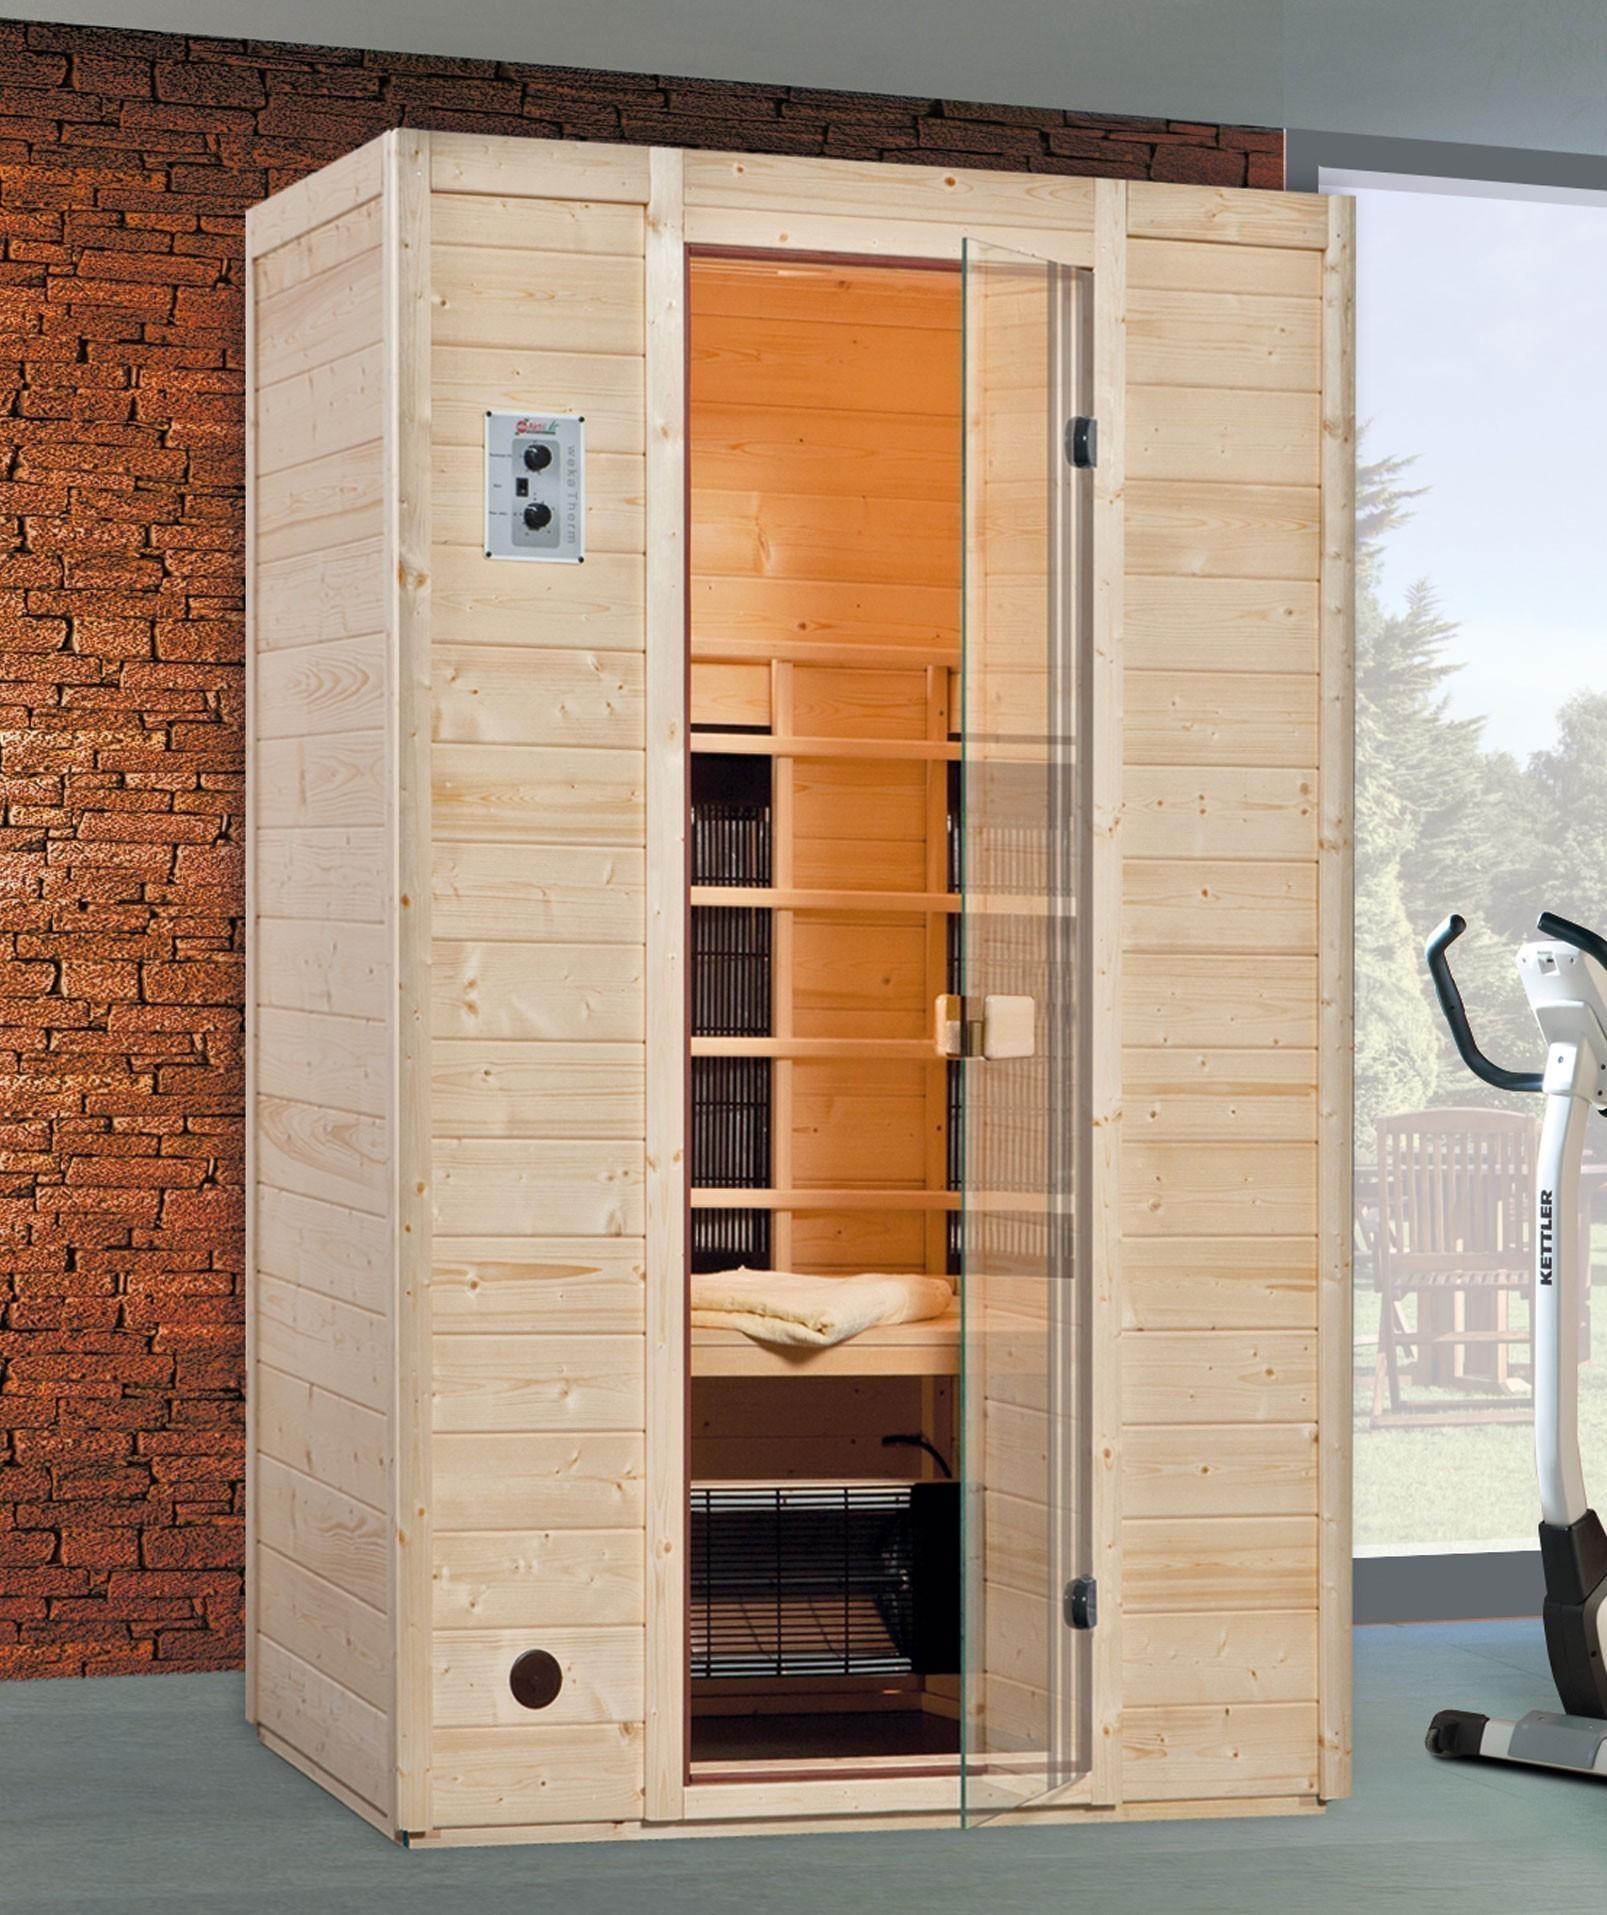 w rmekabine infrarotkabine weka 550 gr 2 mit keramikstrahler bei. Black Bedroom Furniture Sets. Home Design Ideas